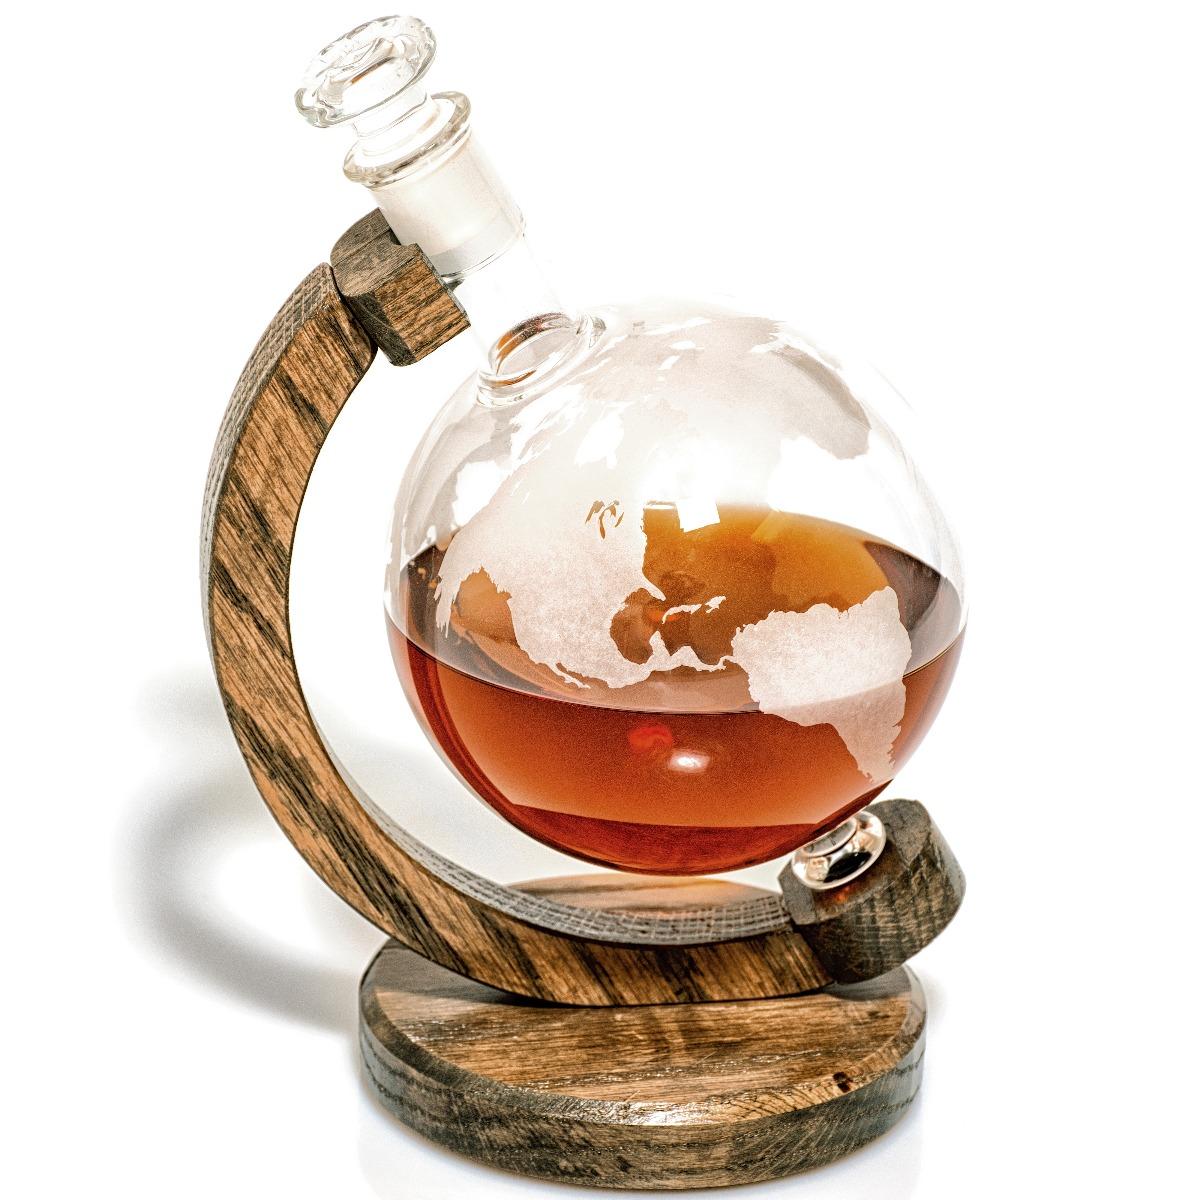 Prestige Decanters 1000 ml Etched Glass Pythagoras Globe wine decanter